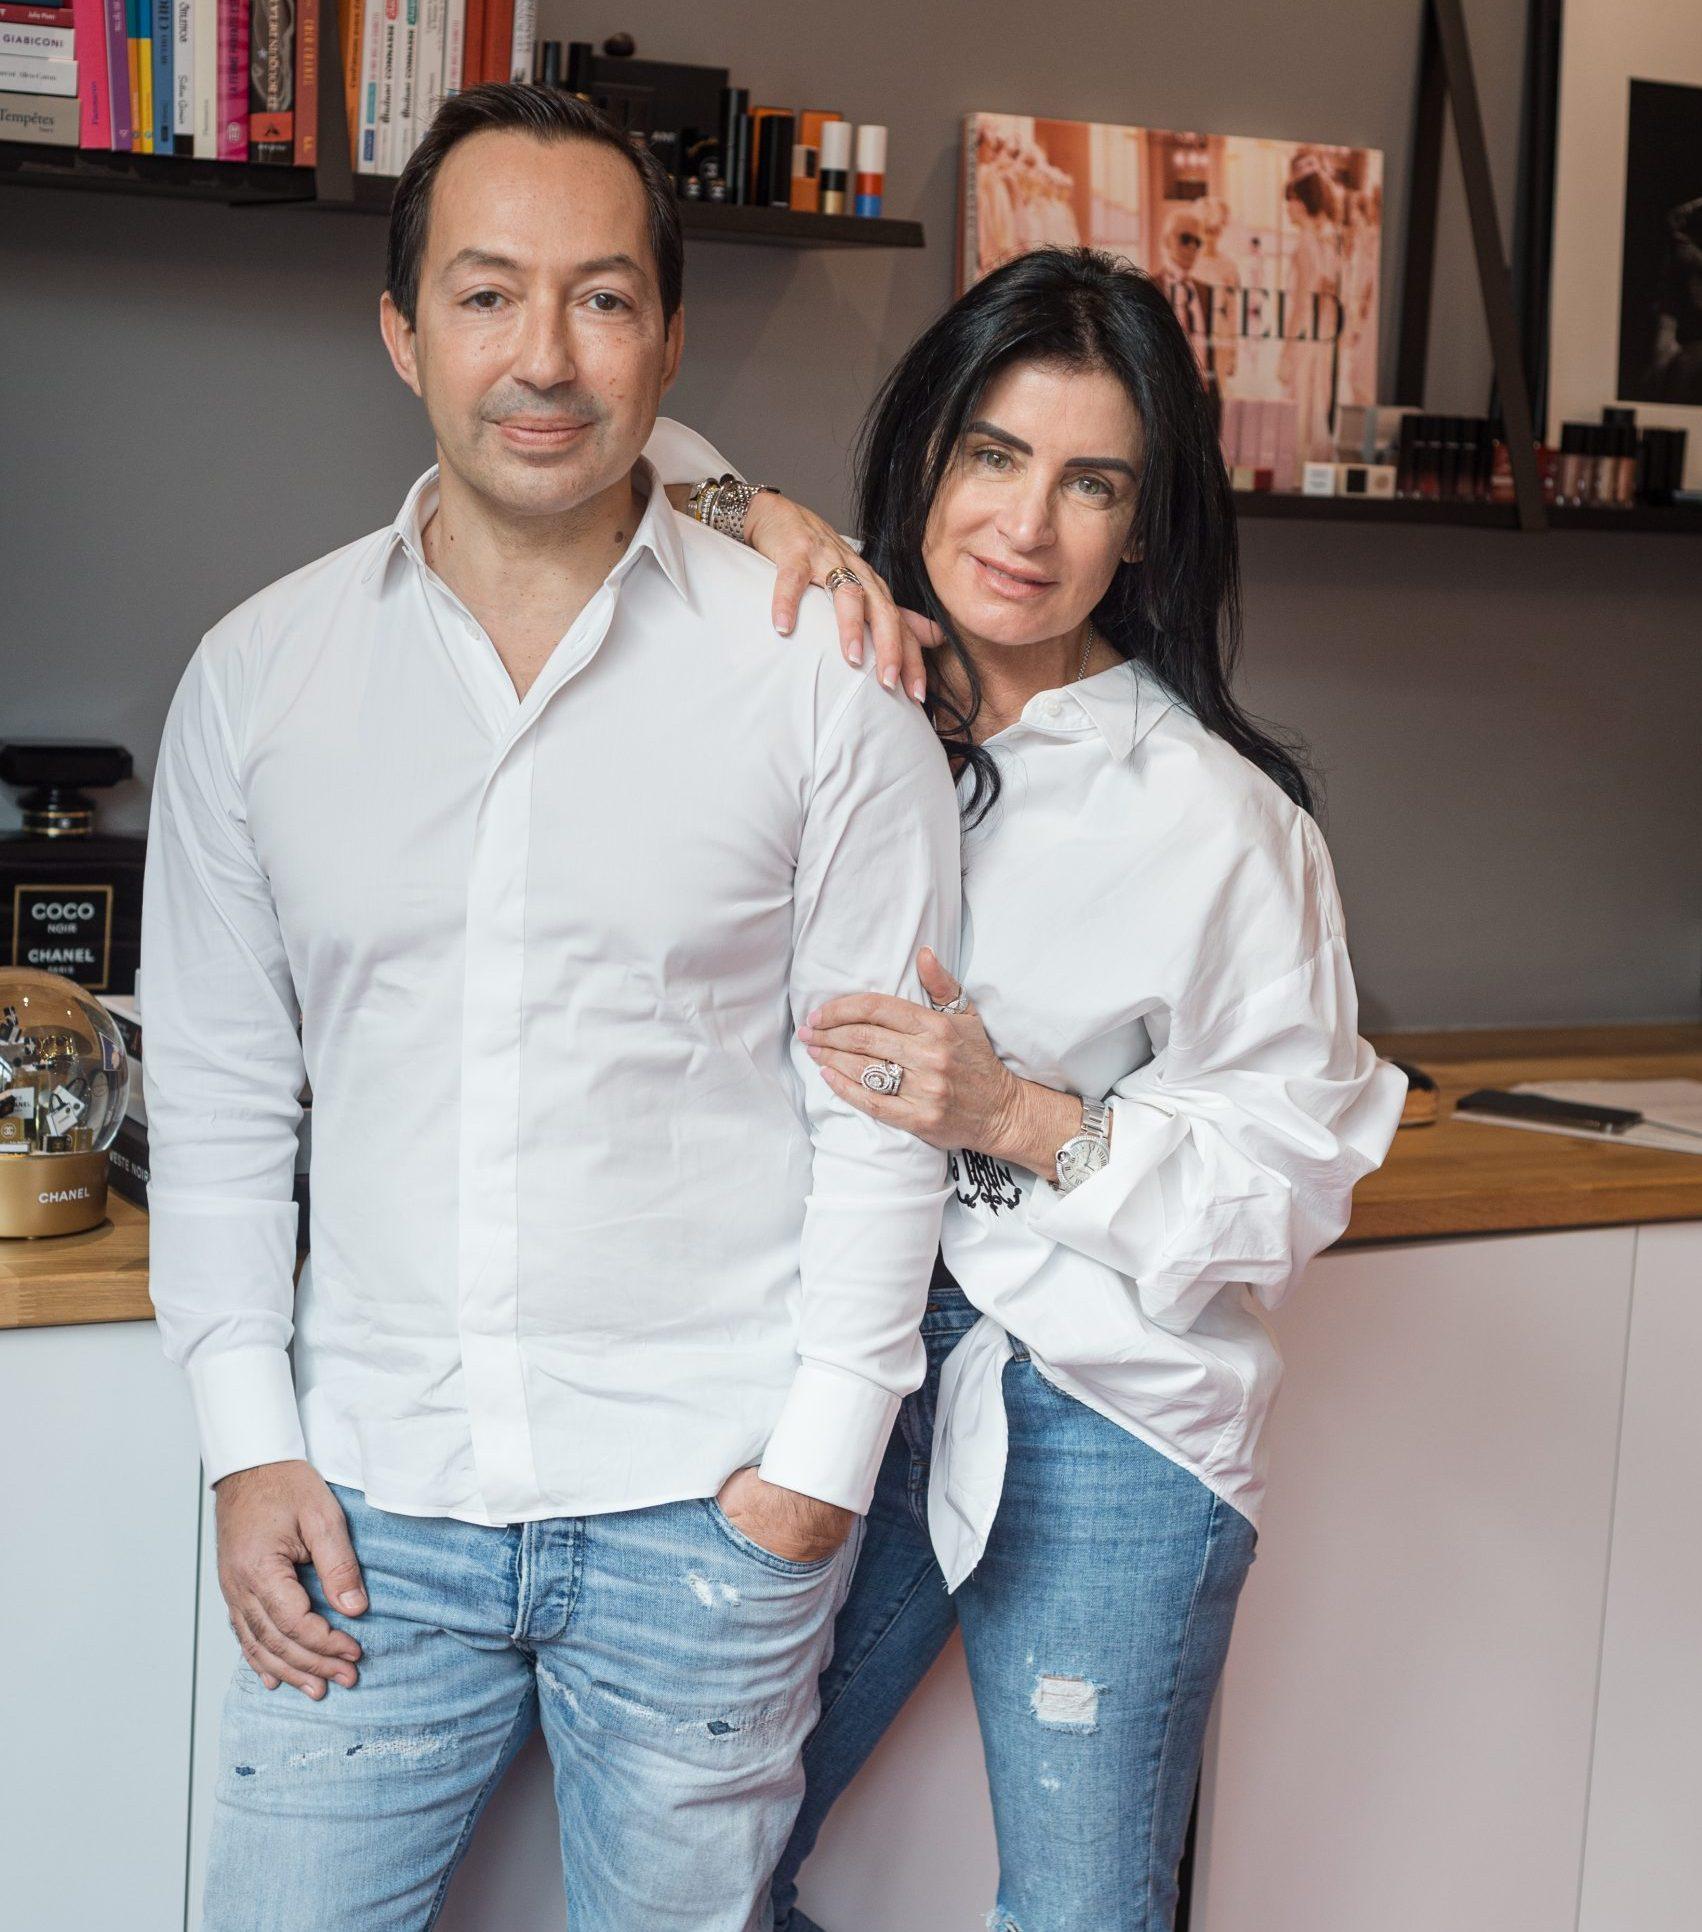 Jean-Baptiste Wautier et sa femme Claudine Annunziata Wautier